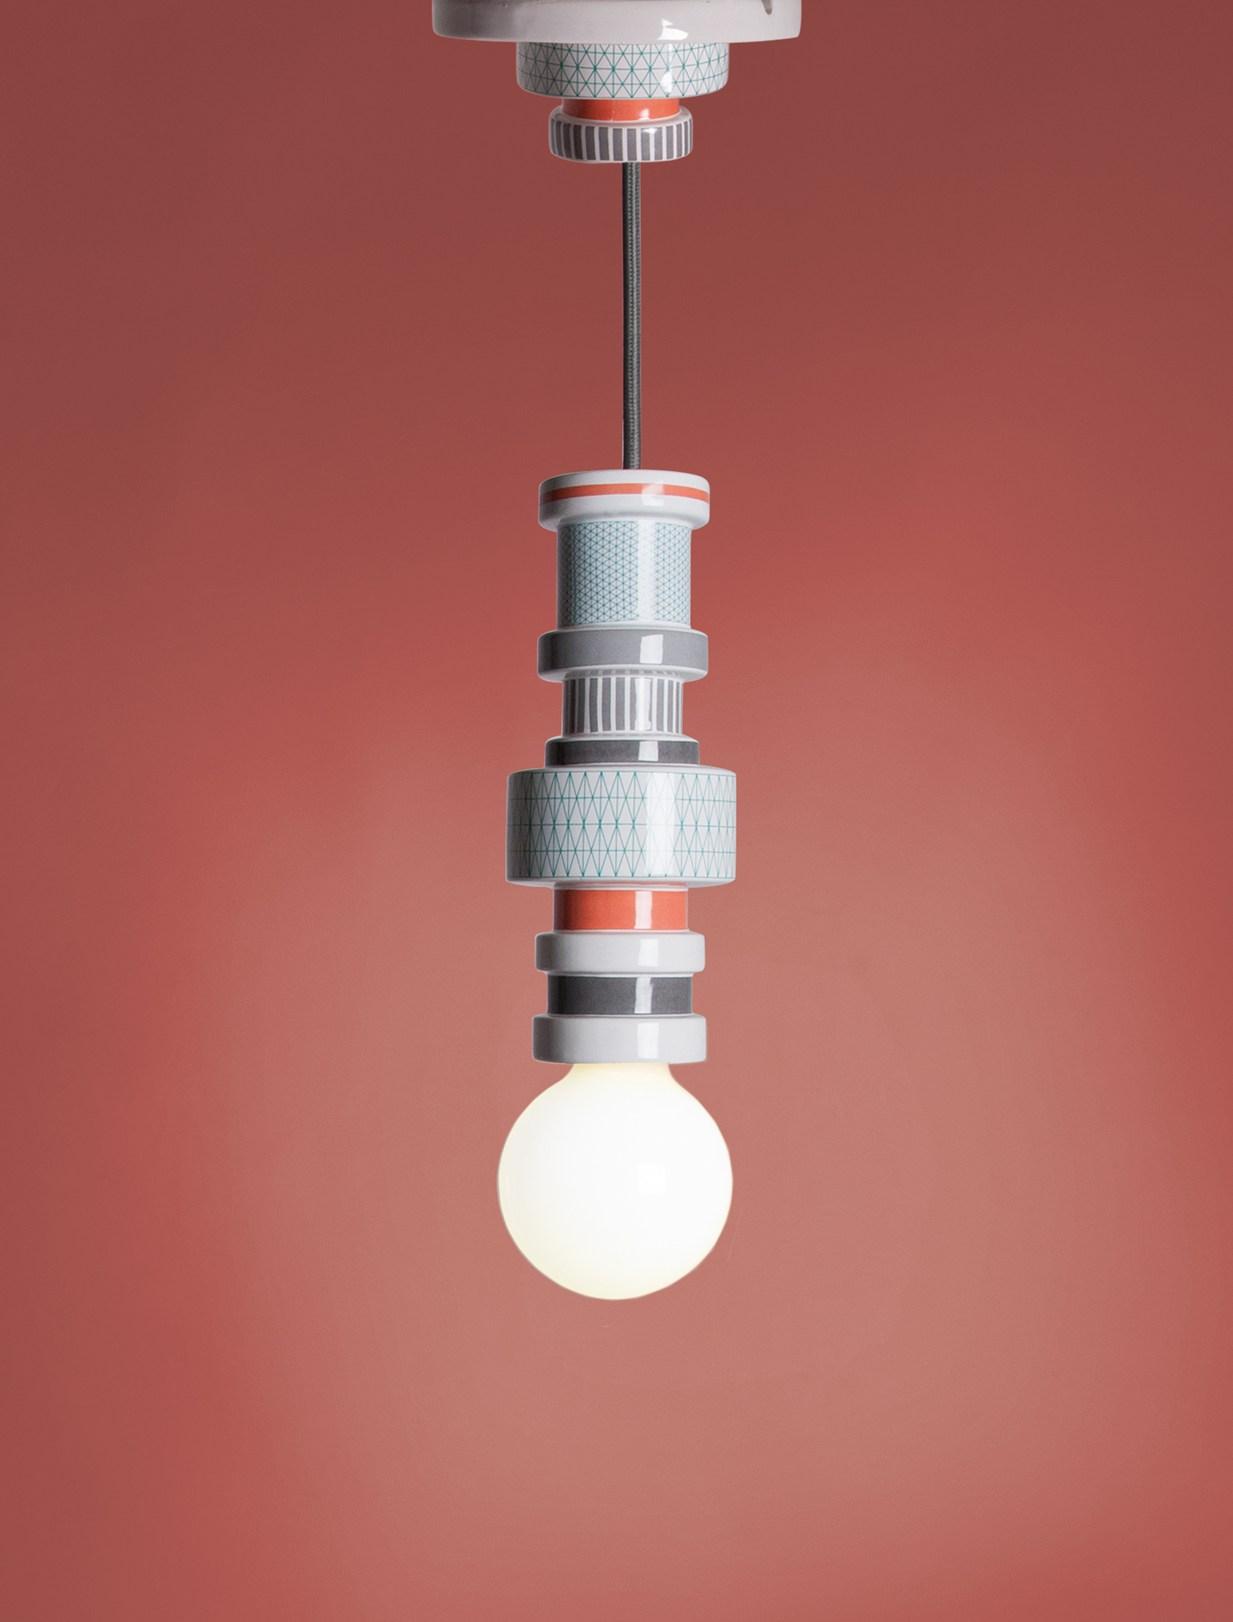 Moresque Pendant Lamp by Alessandro Zambelli for Seletti